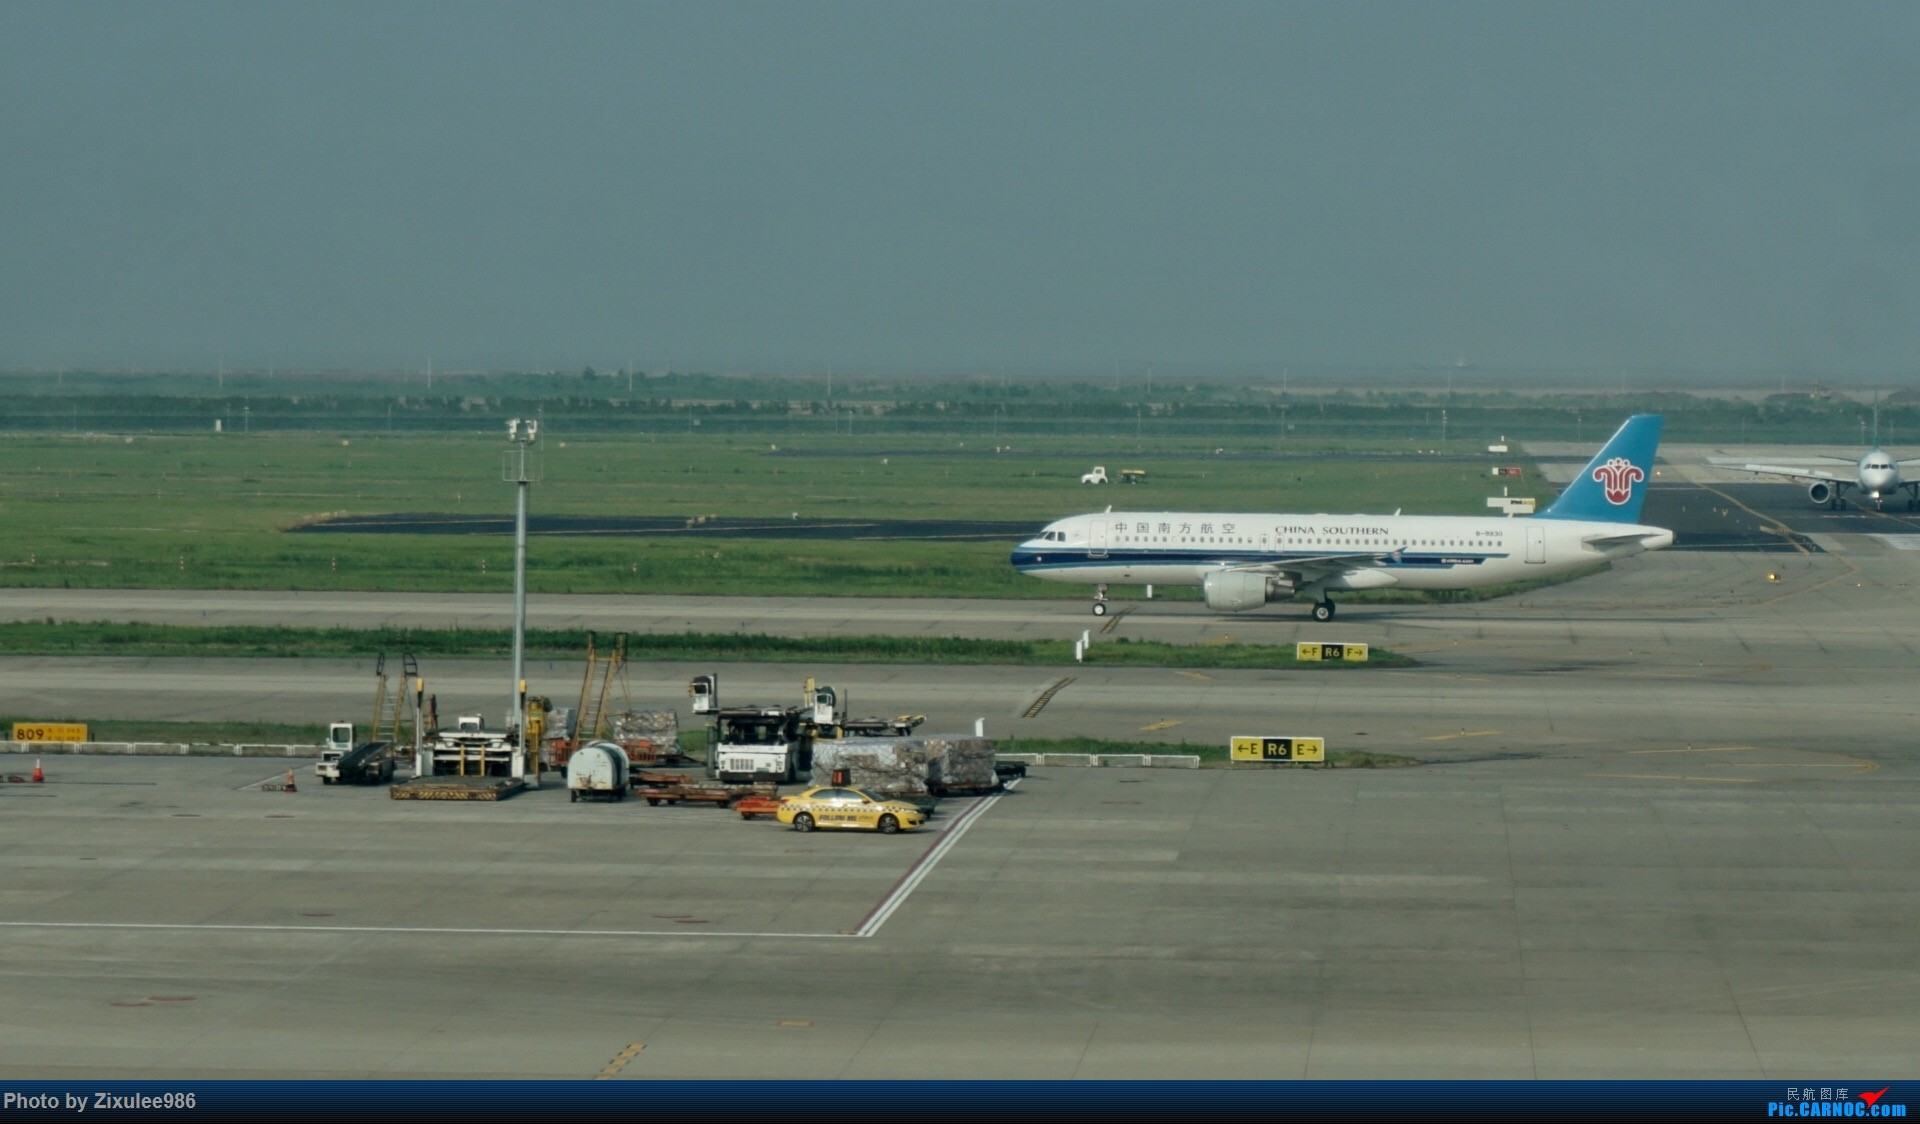 Re:[原创]加拿大21日游学之旅(一)~JJN-PVG-YYZ..(内含flightlog)~第一次发游记~多图缓更请谅解 AIRBUS A320-200 B-9930 中国上海浦东国际机场